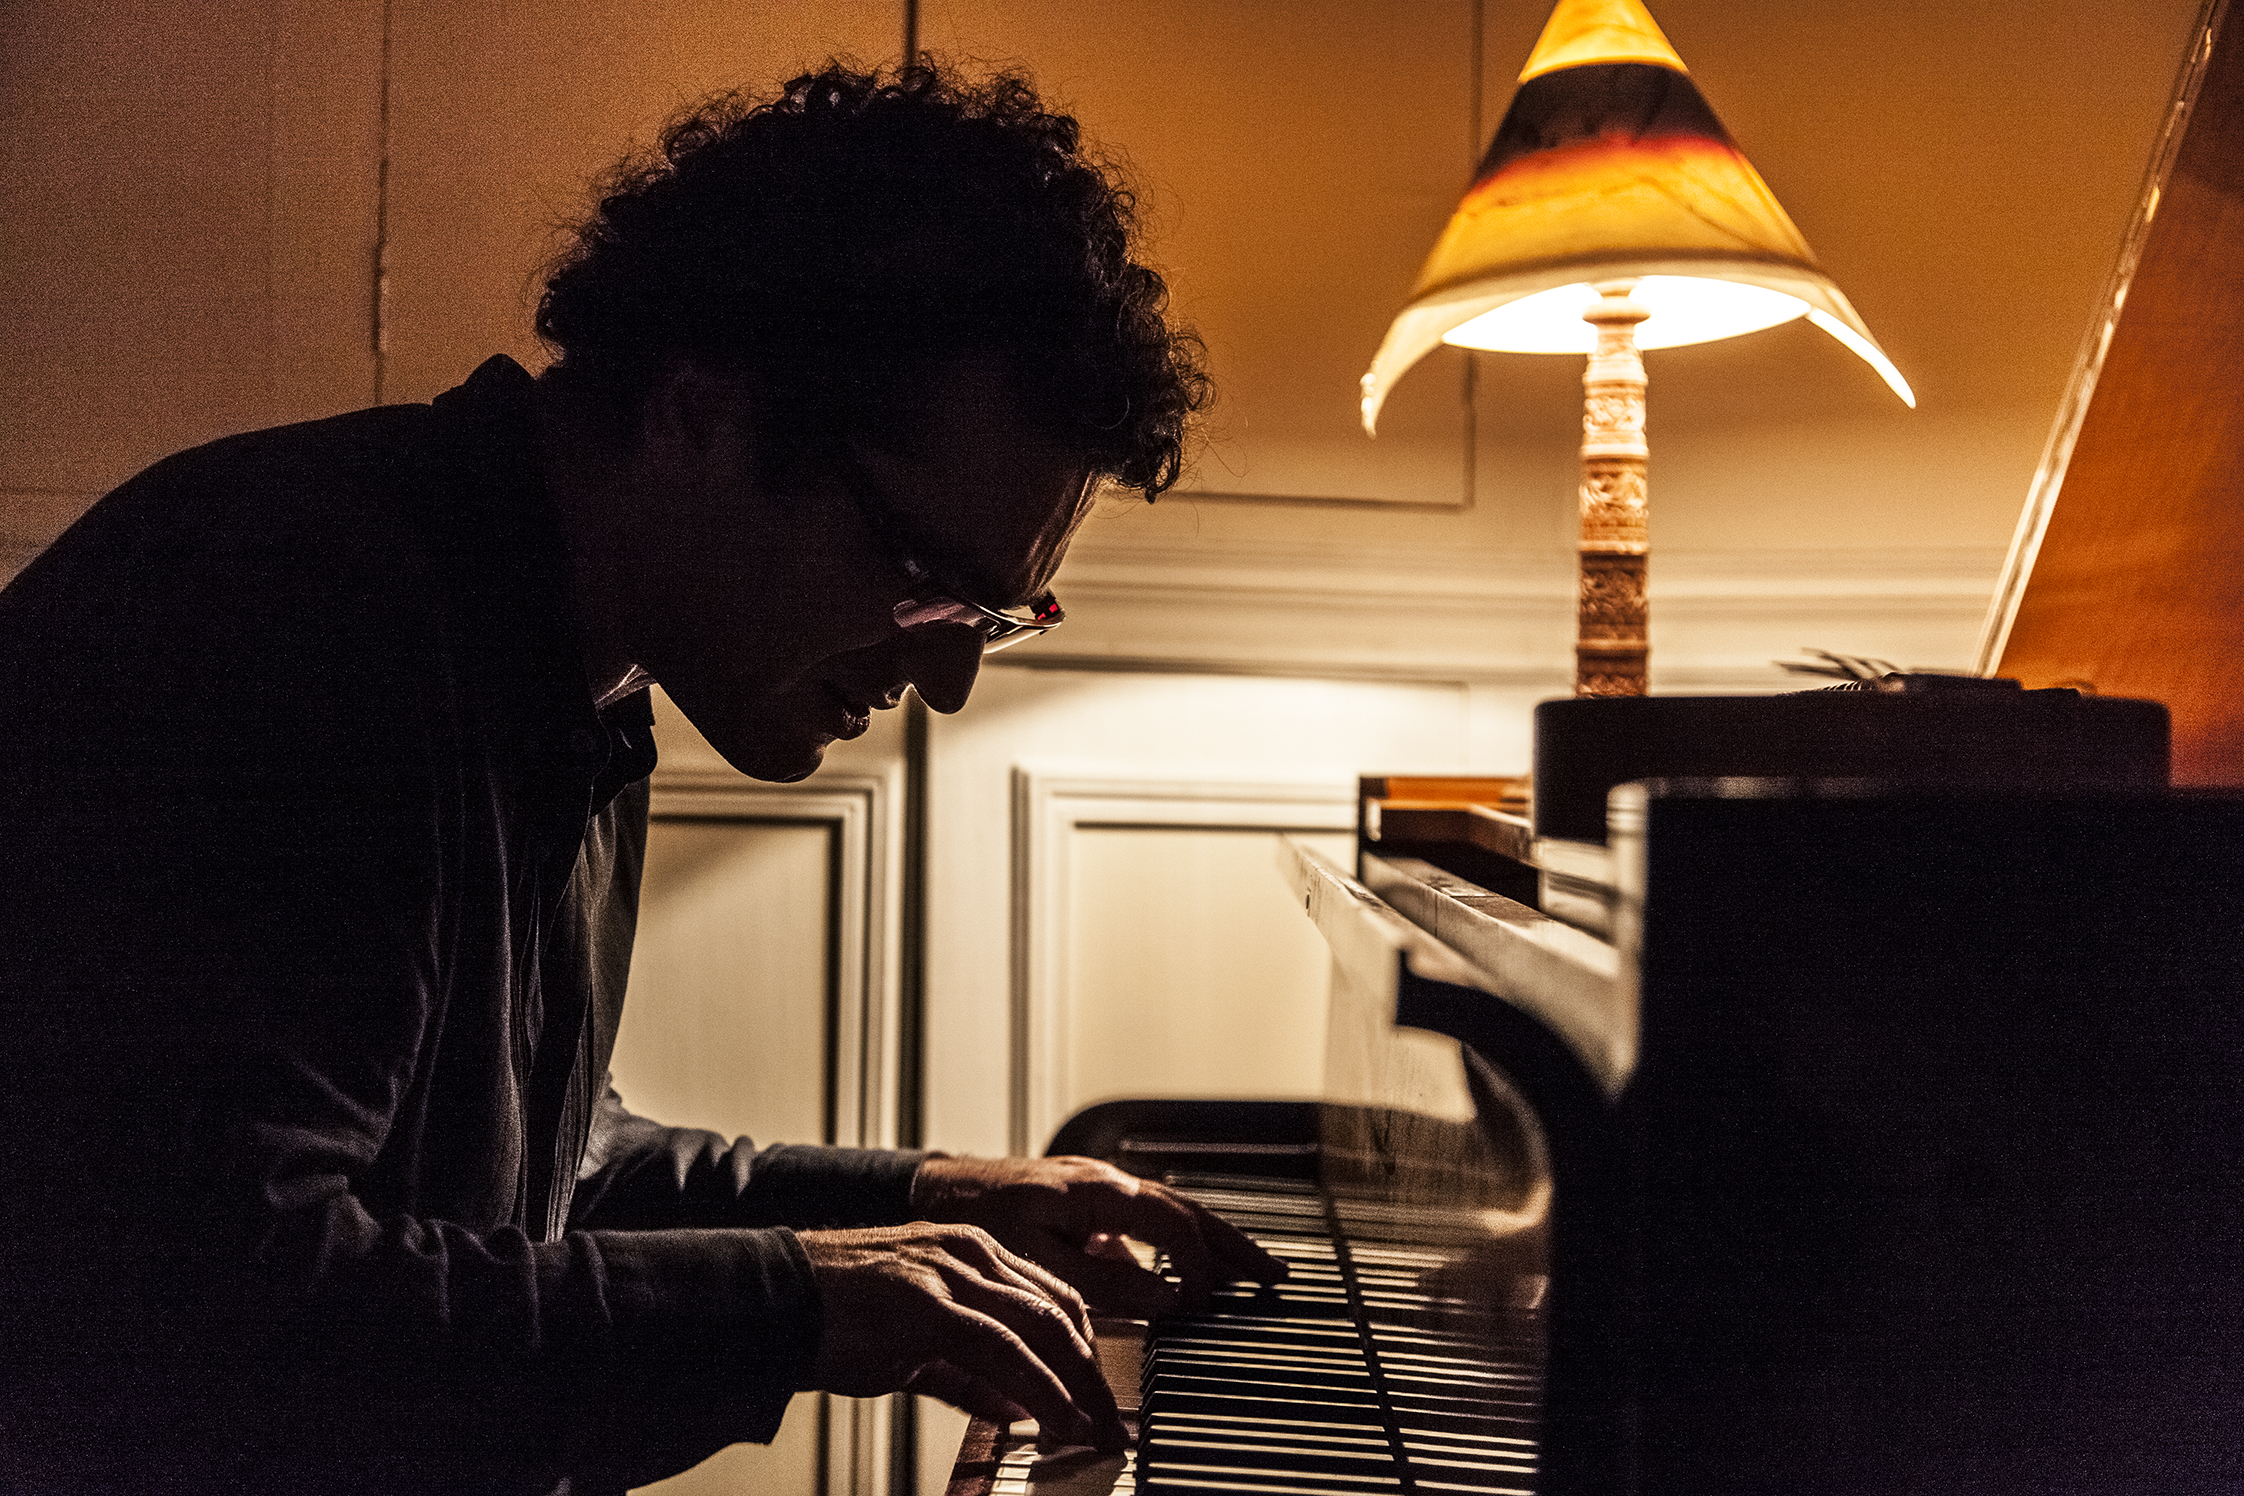 Arshid Azarine, au piano - Paris le 13/03/2014 © Alain Elorza